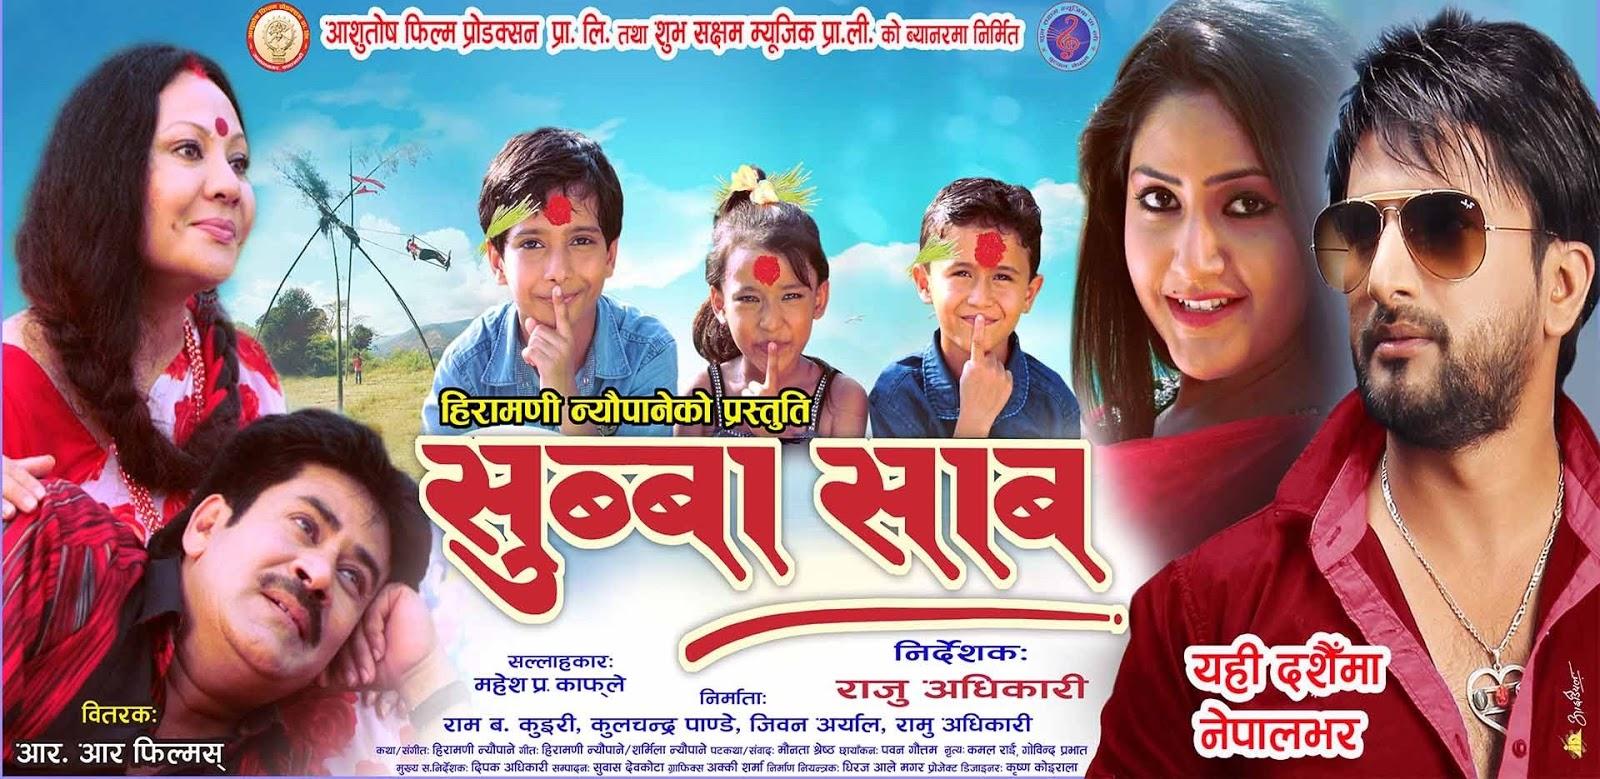 nepali film subba sab poster